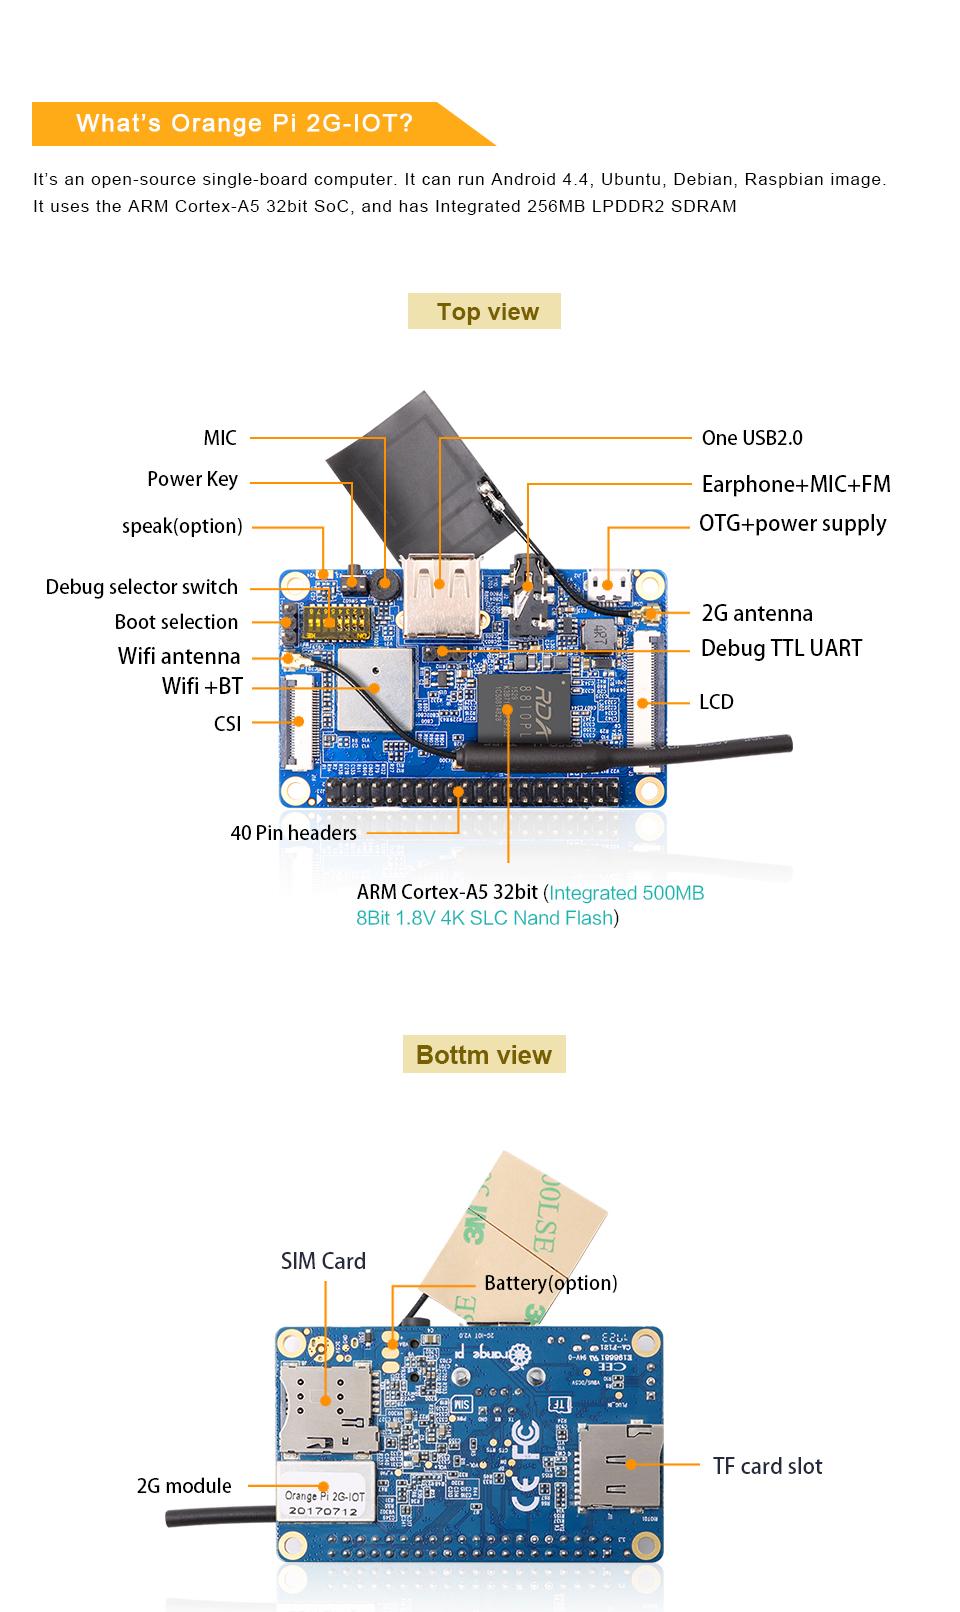 Orange Pi 2g-iot Arm Cortex-a5 32bit Bluetooth Support Ubuntu Linux And  Android Mini Pc Beyond Raspberry Pi 2 - Buy Orange Pi 2g-iot,Orange  Pi,Orange